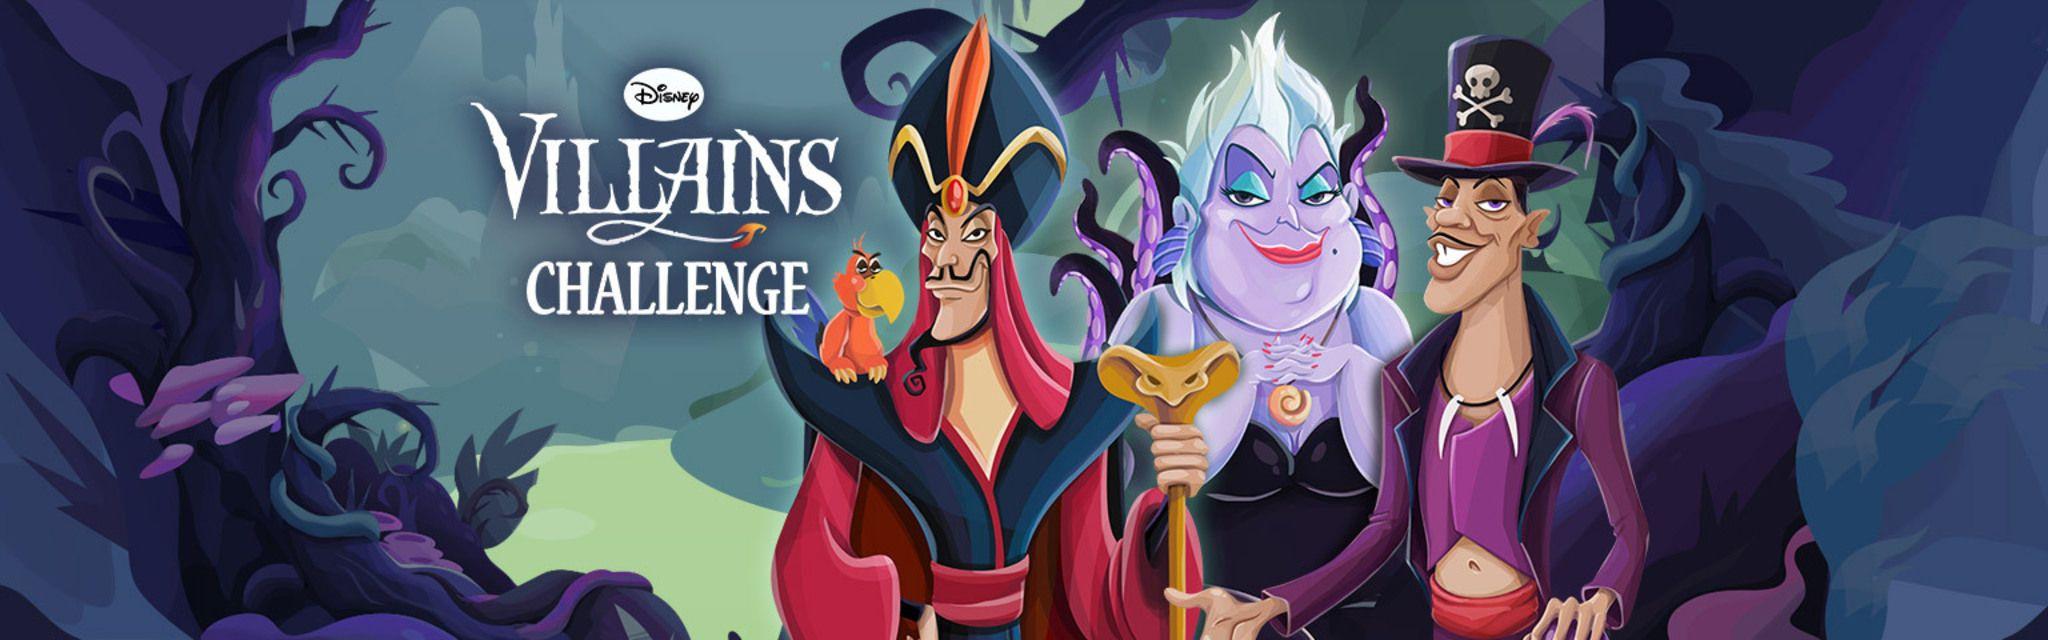 Pin On Disney Baddies Villains Excluding Maleficent